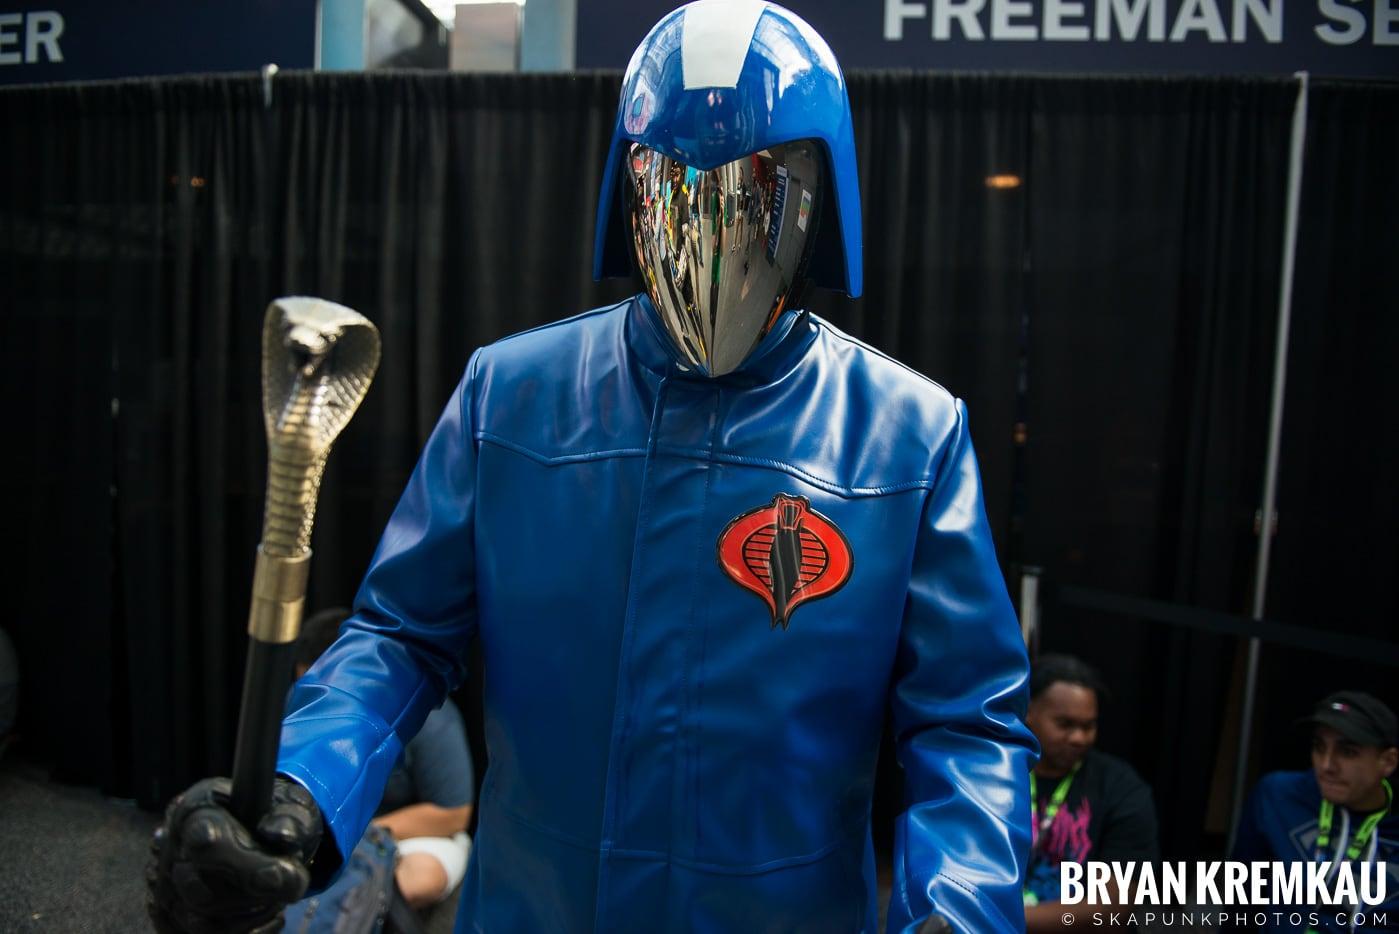 New York Comic Con 2018: Friday - 10.5.18 (48)